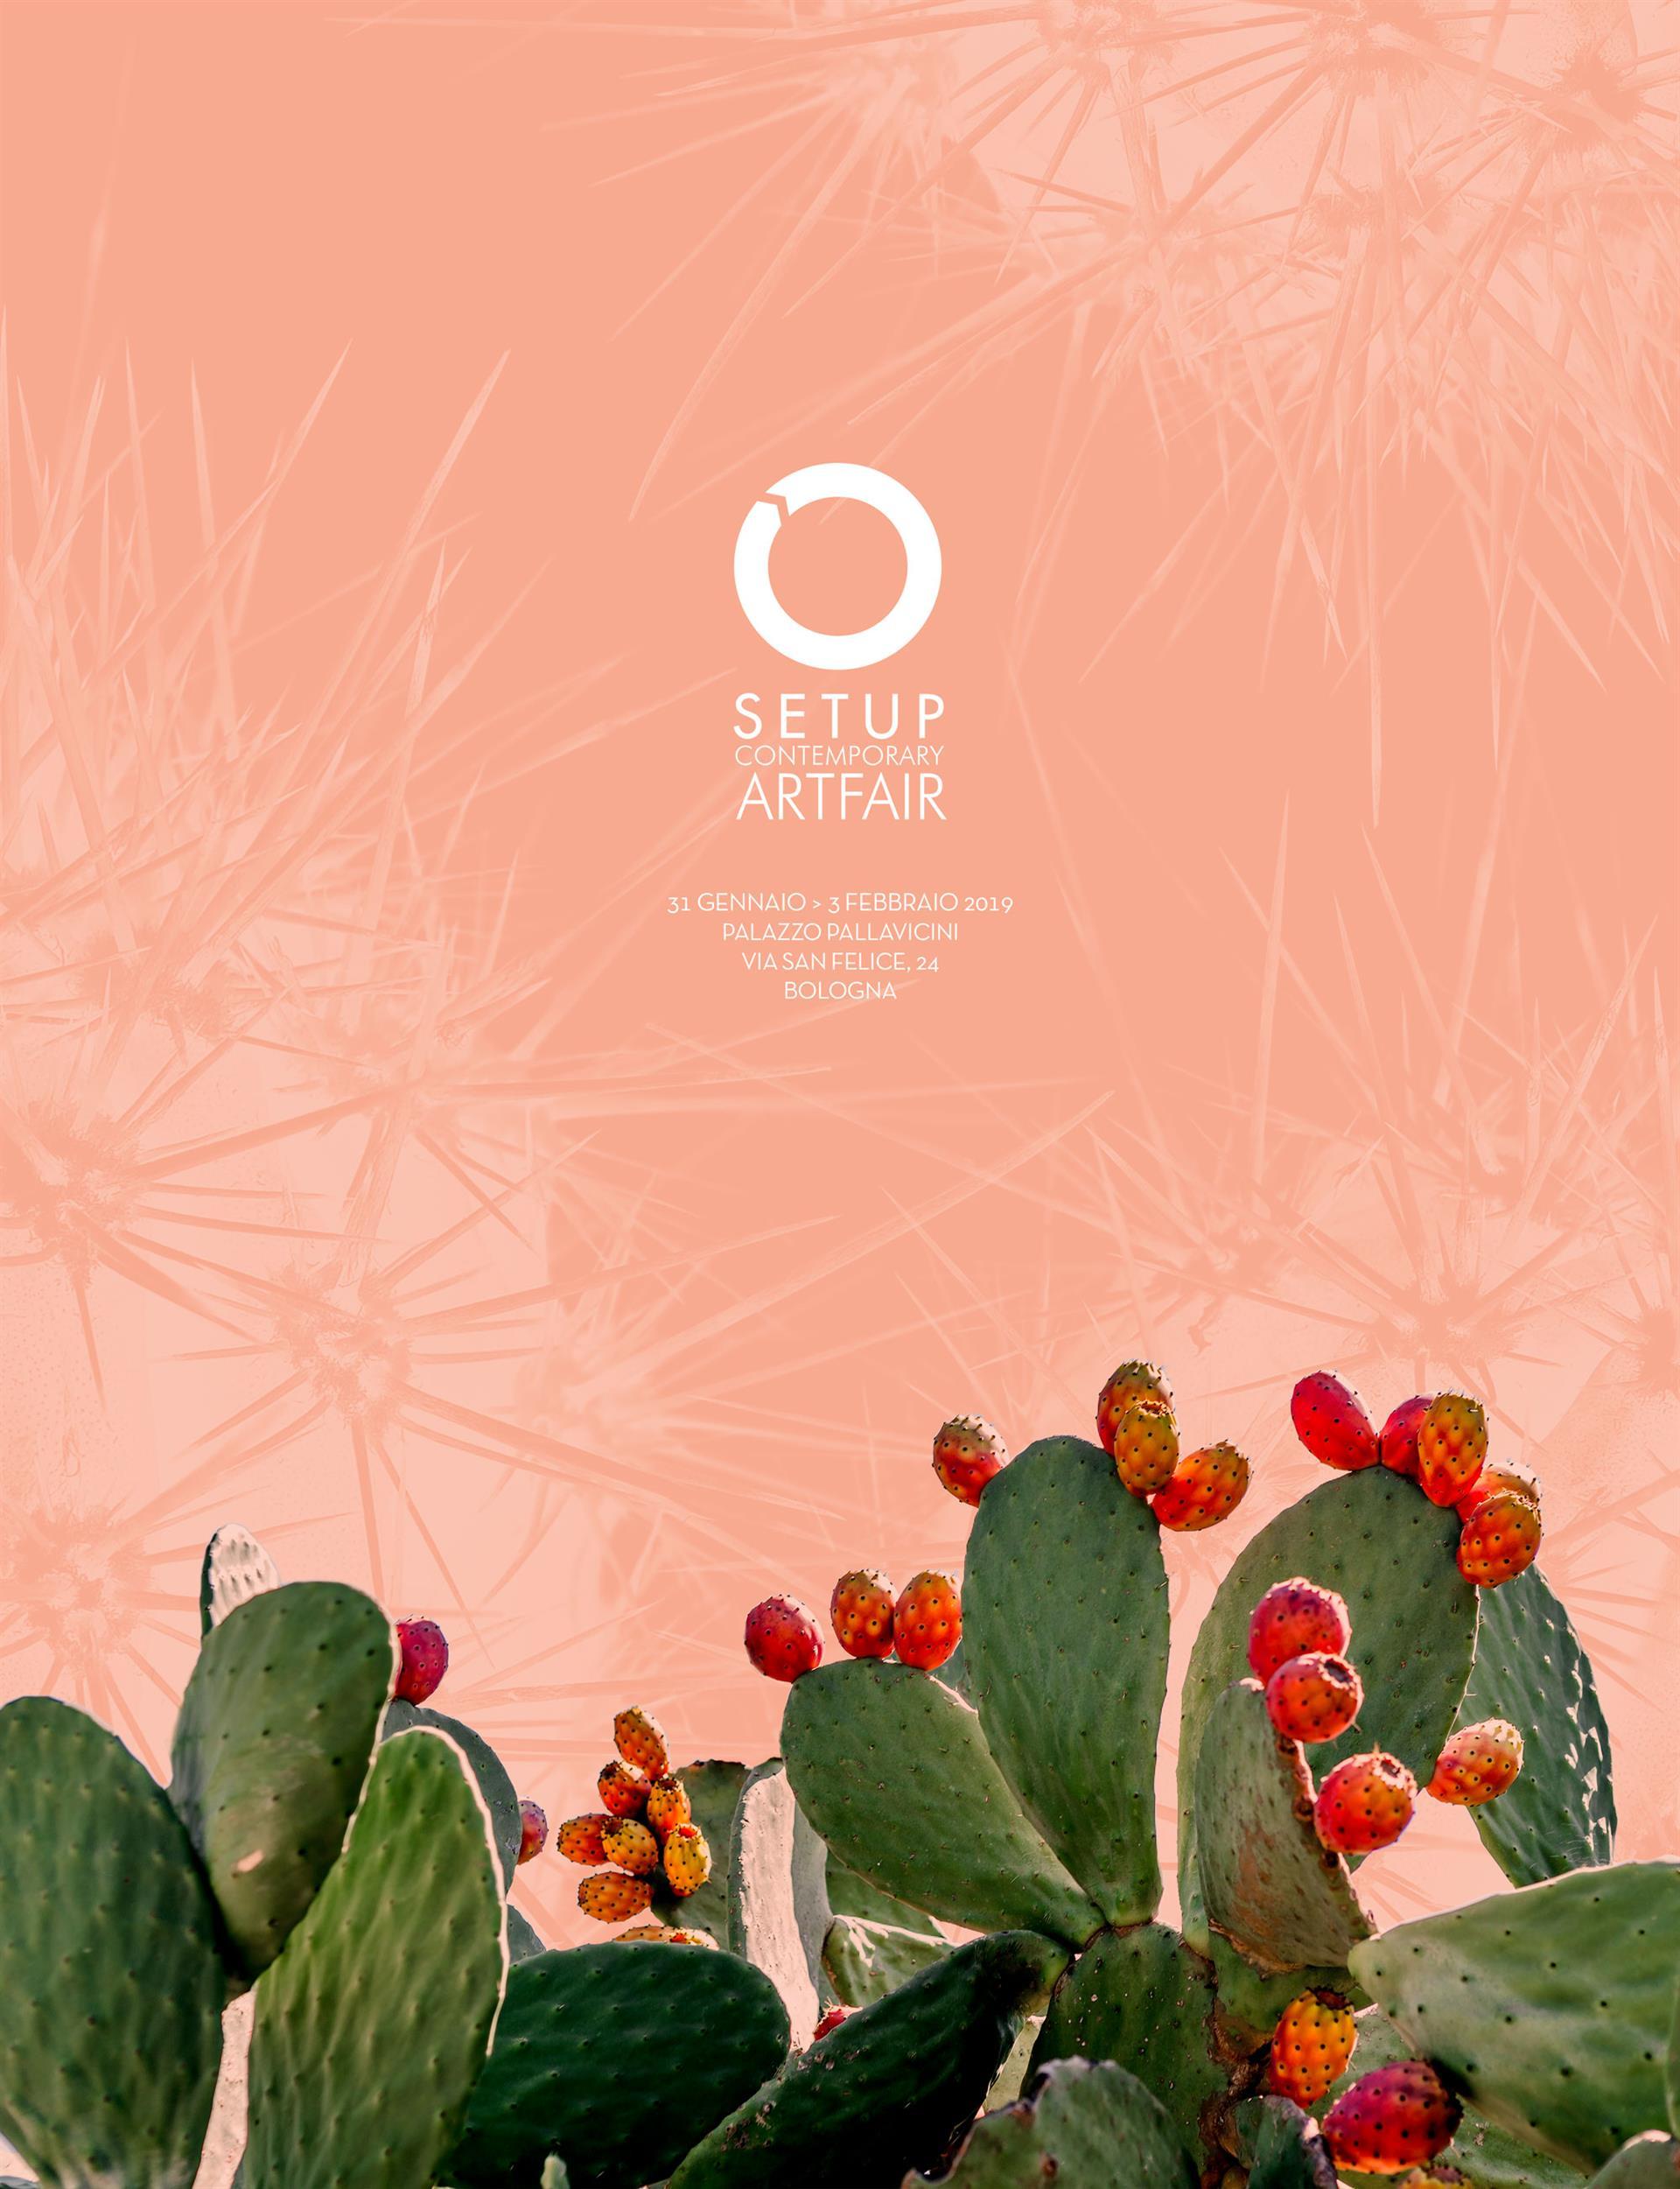 prova-cactus-fiorito-setup-no-punte(0)